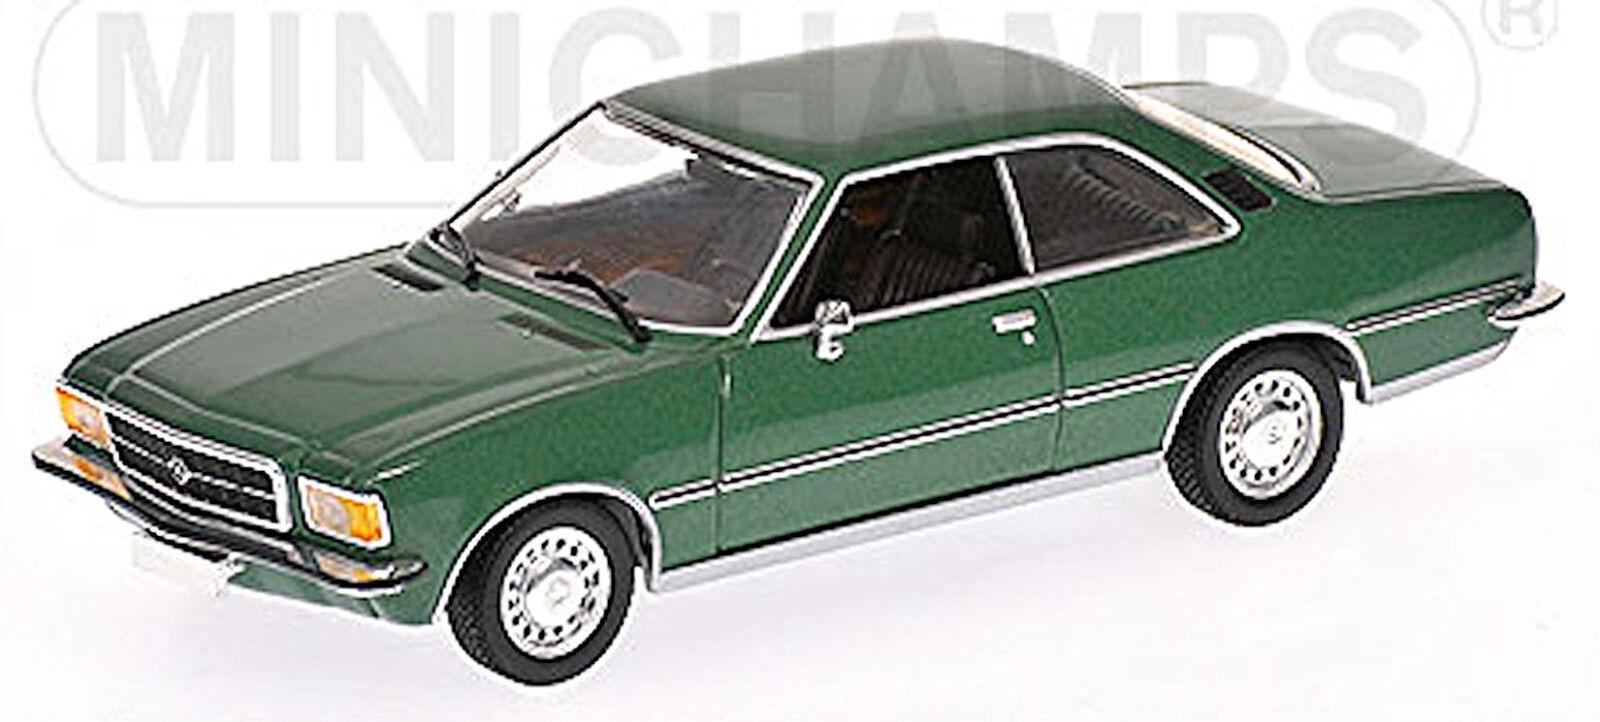 Opel Rekord D Coupe 1971-77 jade green green metallic 1 43 Minichamps